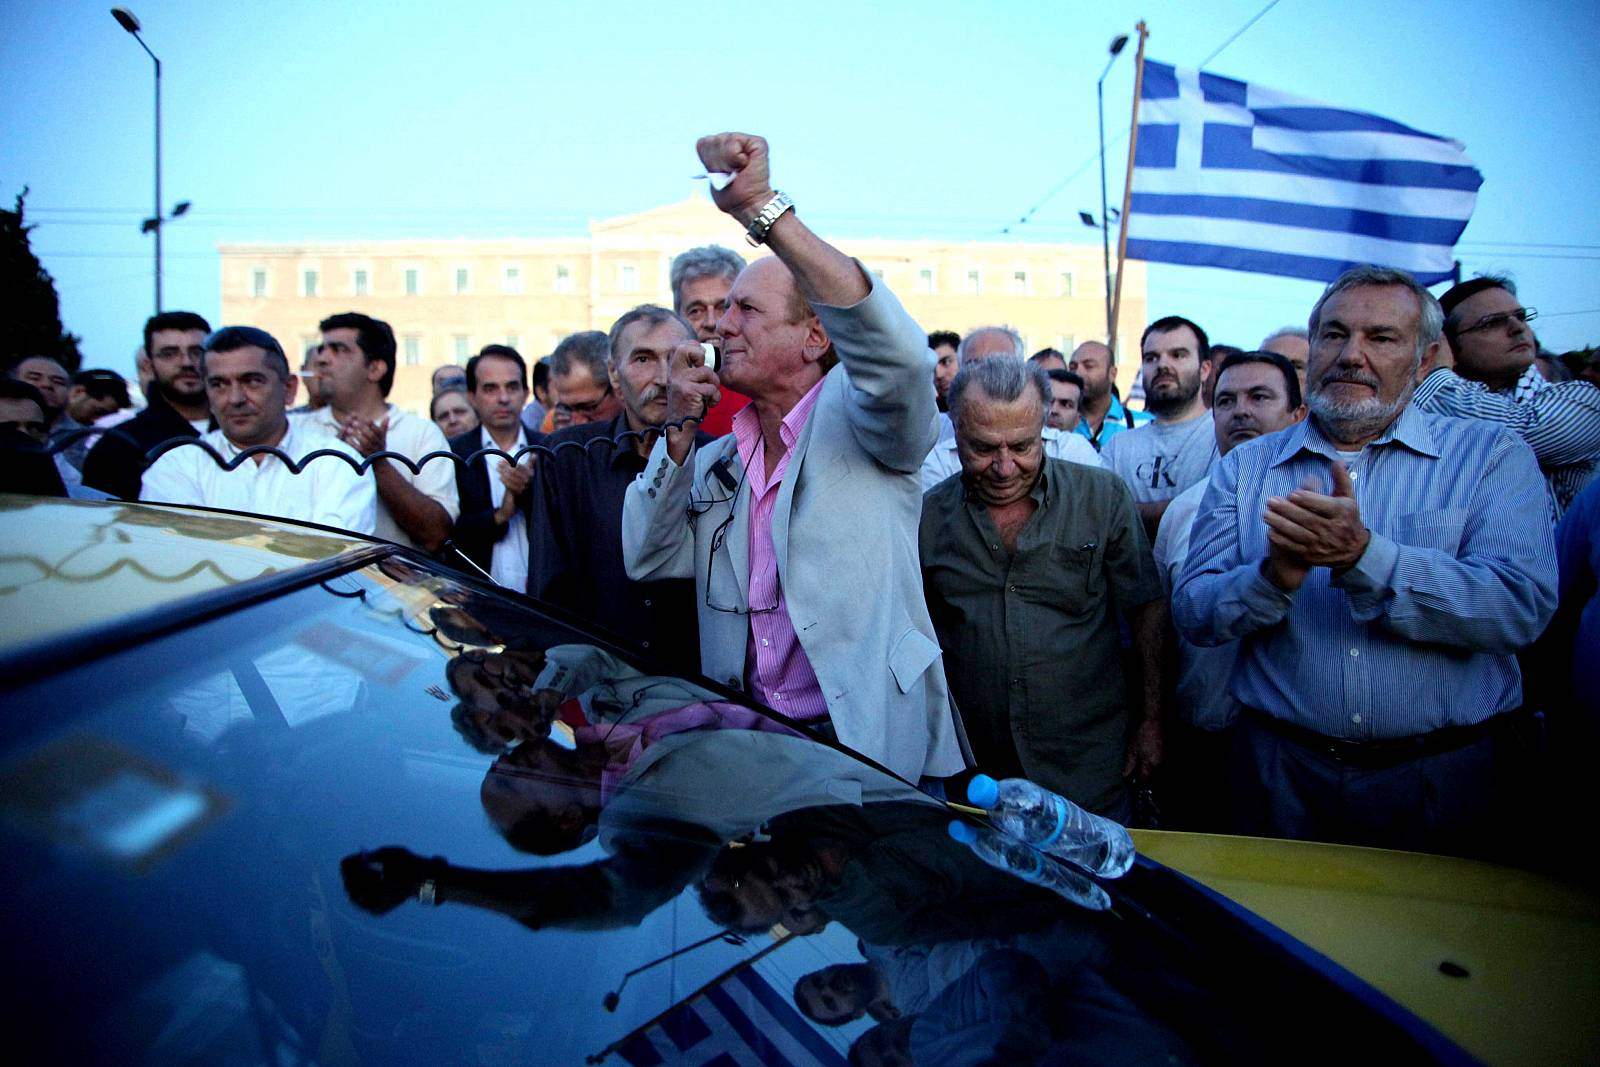 thymios-lymperopoulos-taxi-uber-6-570